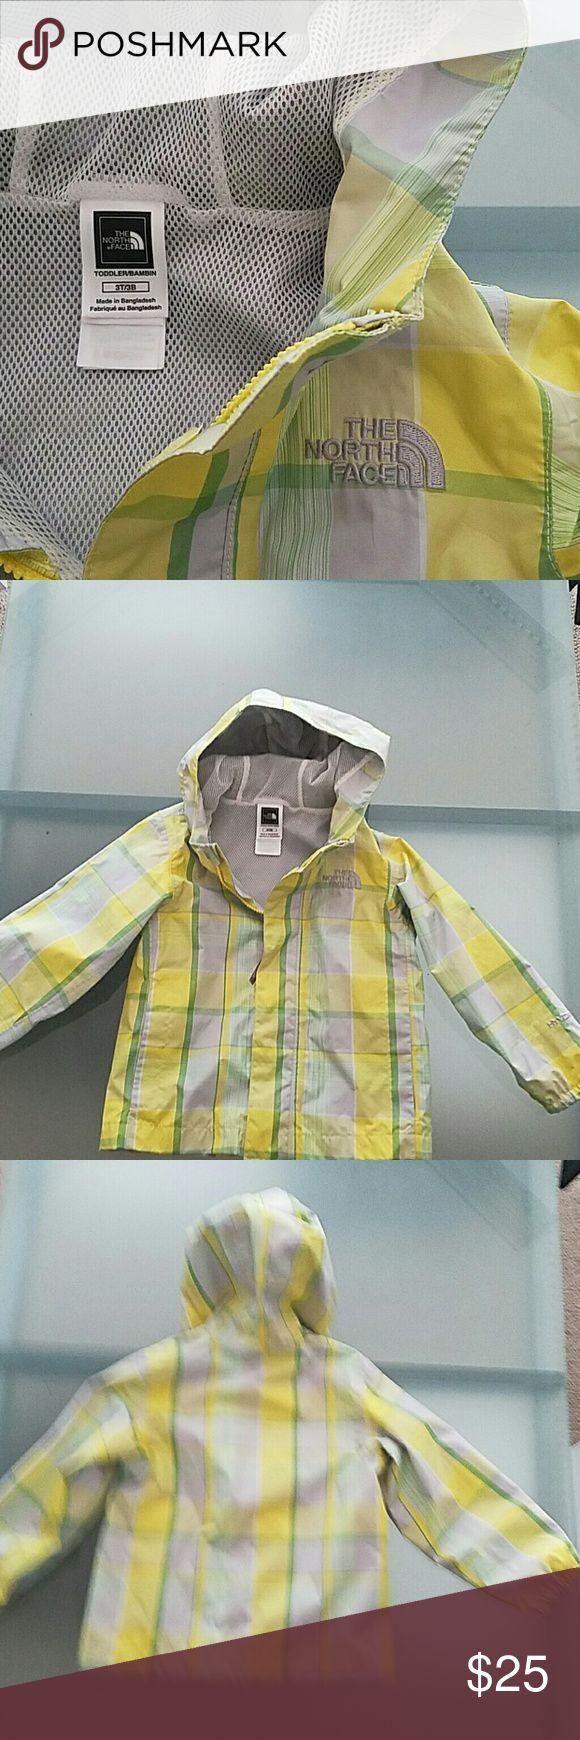 North Face Rain Jacket 3T Spring plaid, HyVent toddler rain jacket by The North Face. The North Face Jackets & Coats Raincoats